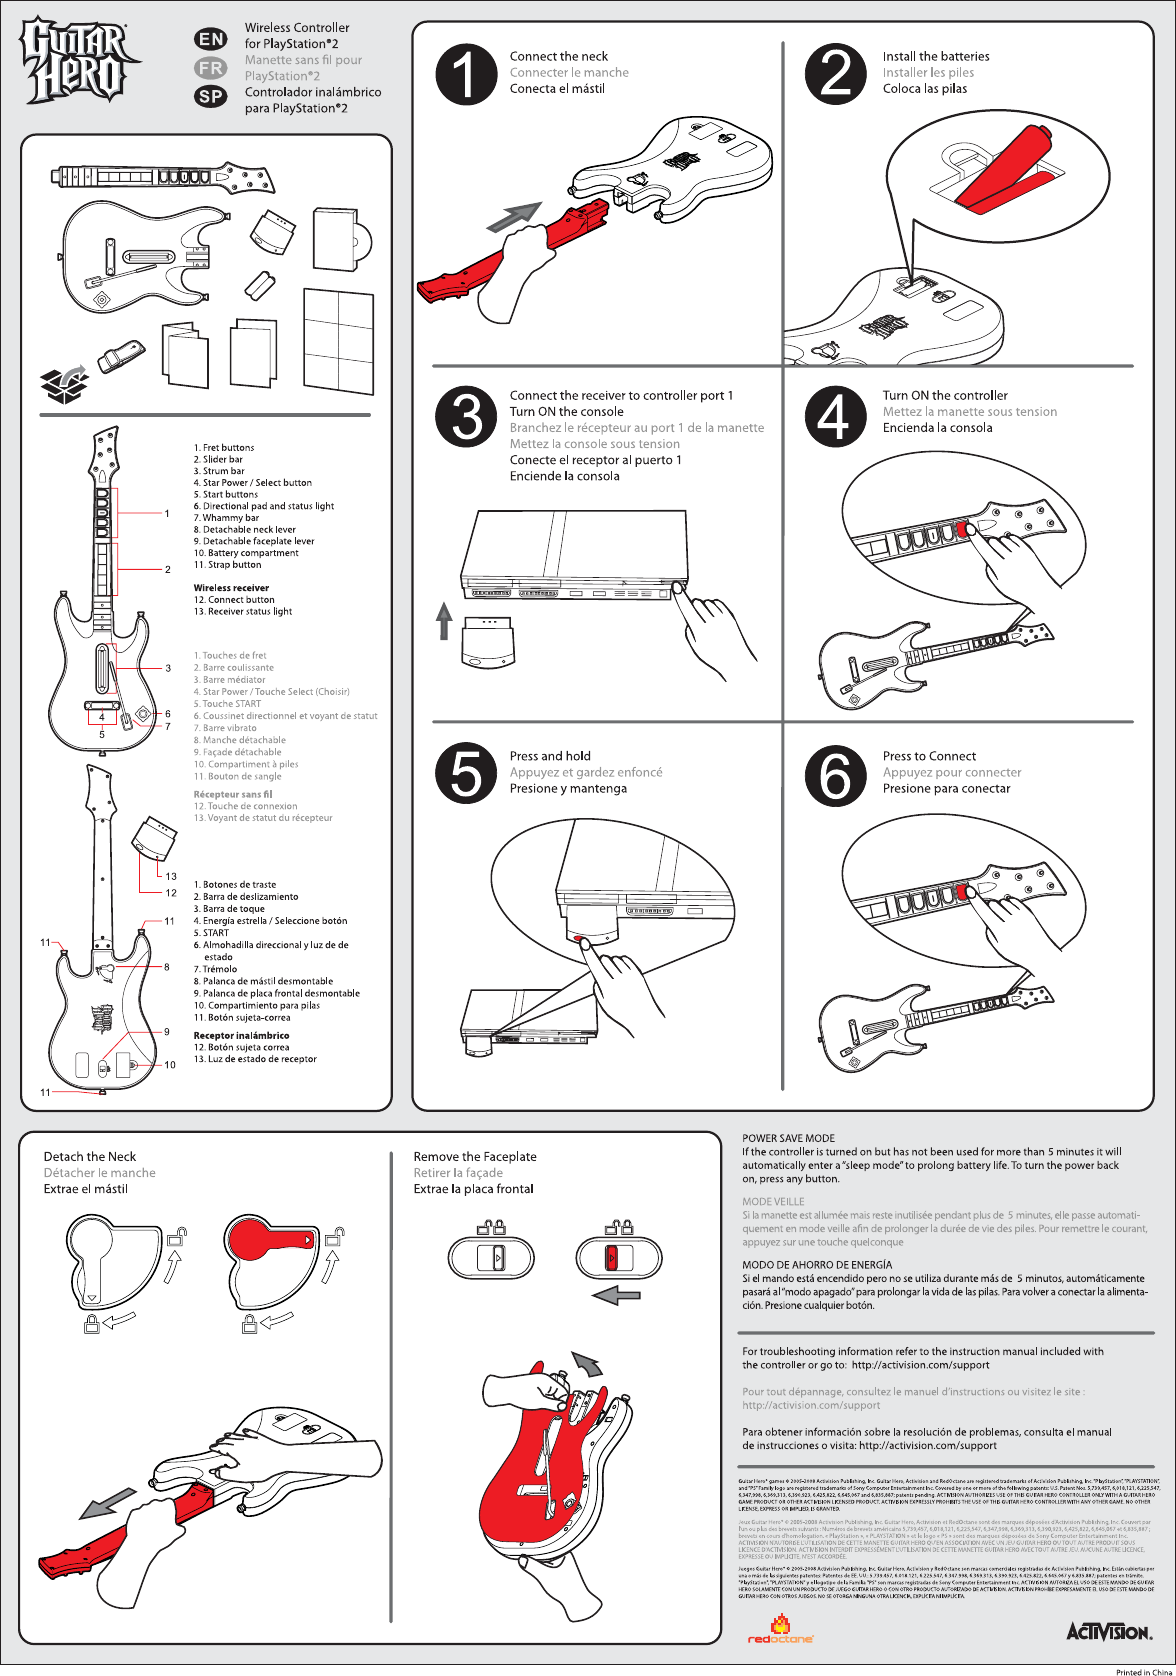 redoctane bw95449806 guitar hero world tour ps2 wireless controller rh usermanual wiki Spanish Guitar Hero World Tour Wii Guitar Hero World Tour